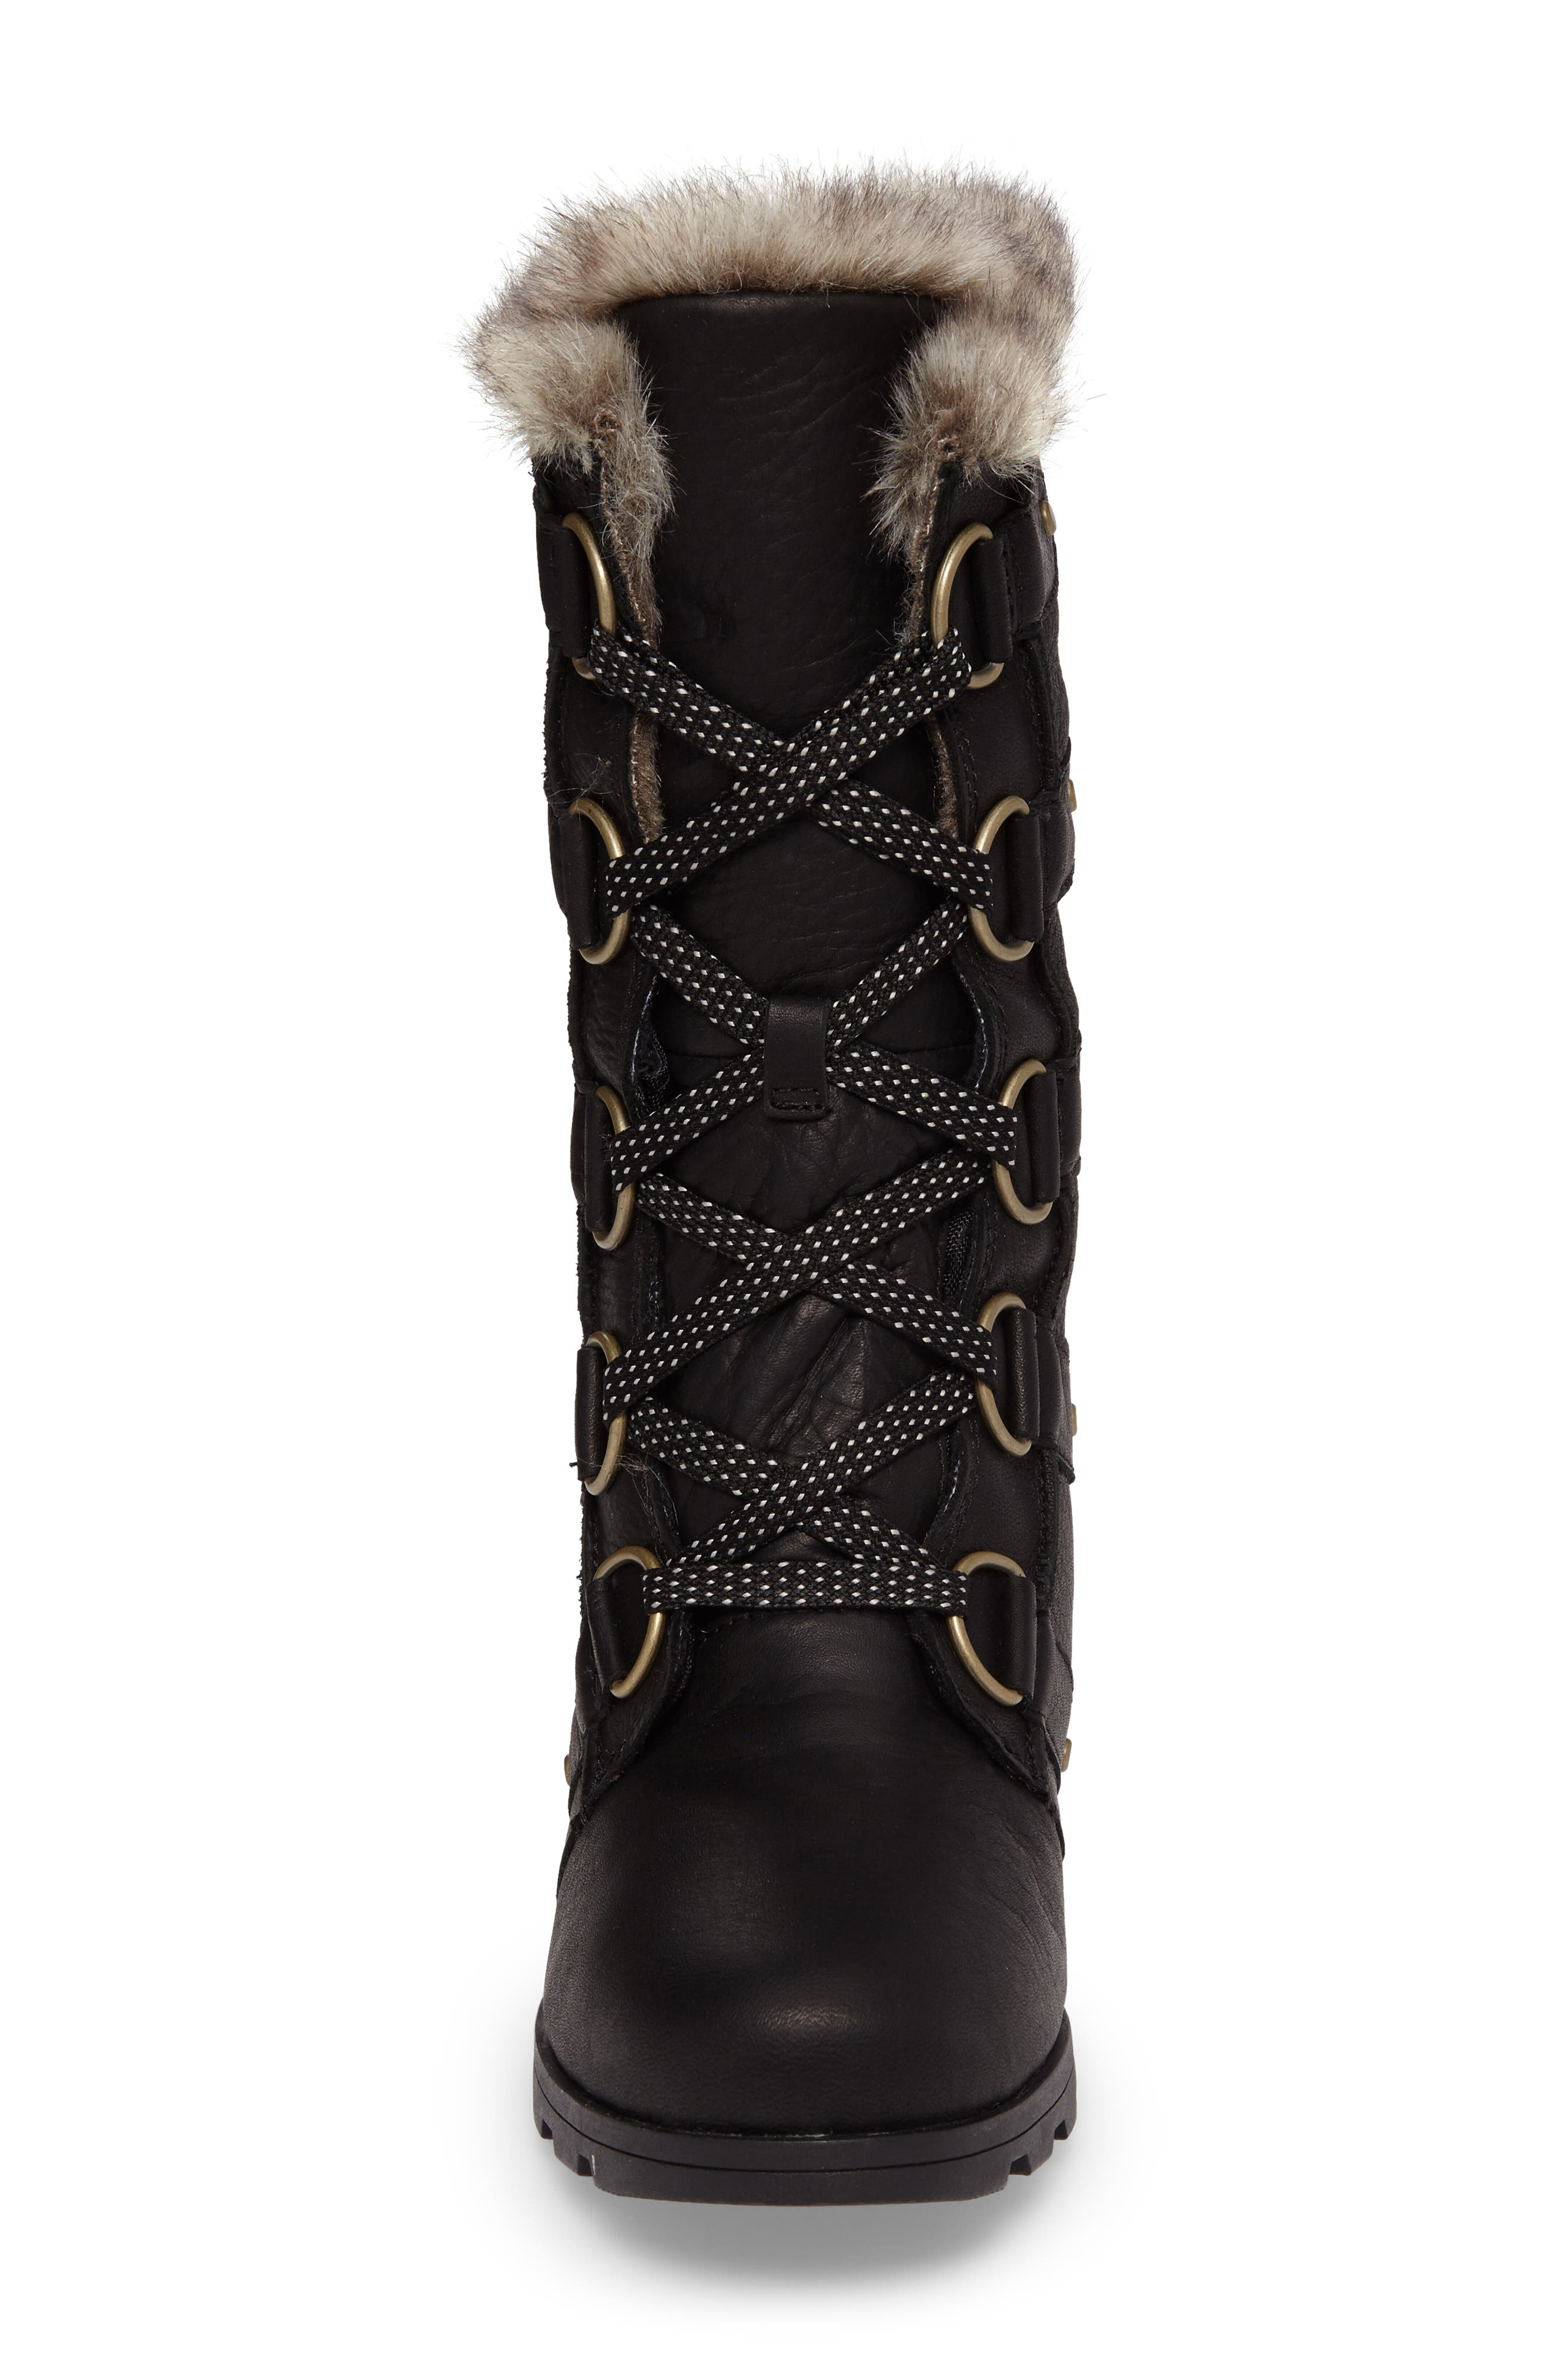 Emelie Waterproof Lace Up Boot with Faux Fur Trim,                             Alternate thumbnail 4, color,                             Black